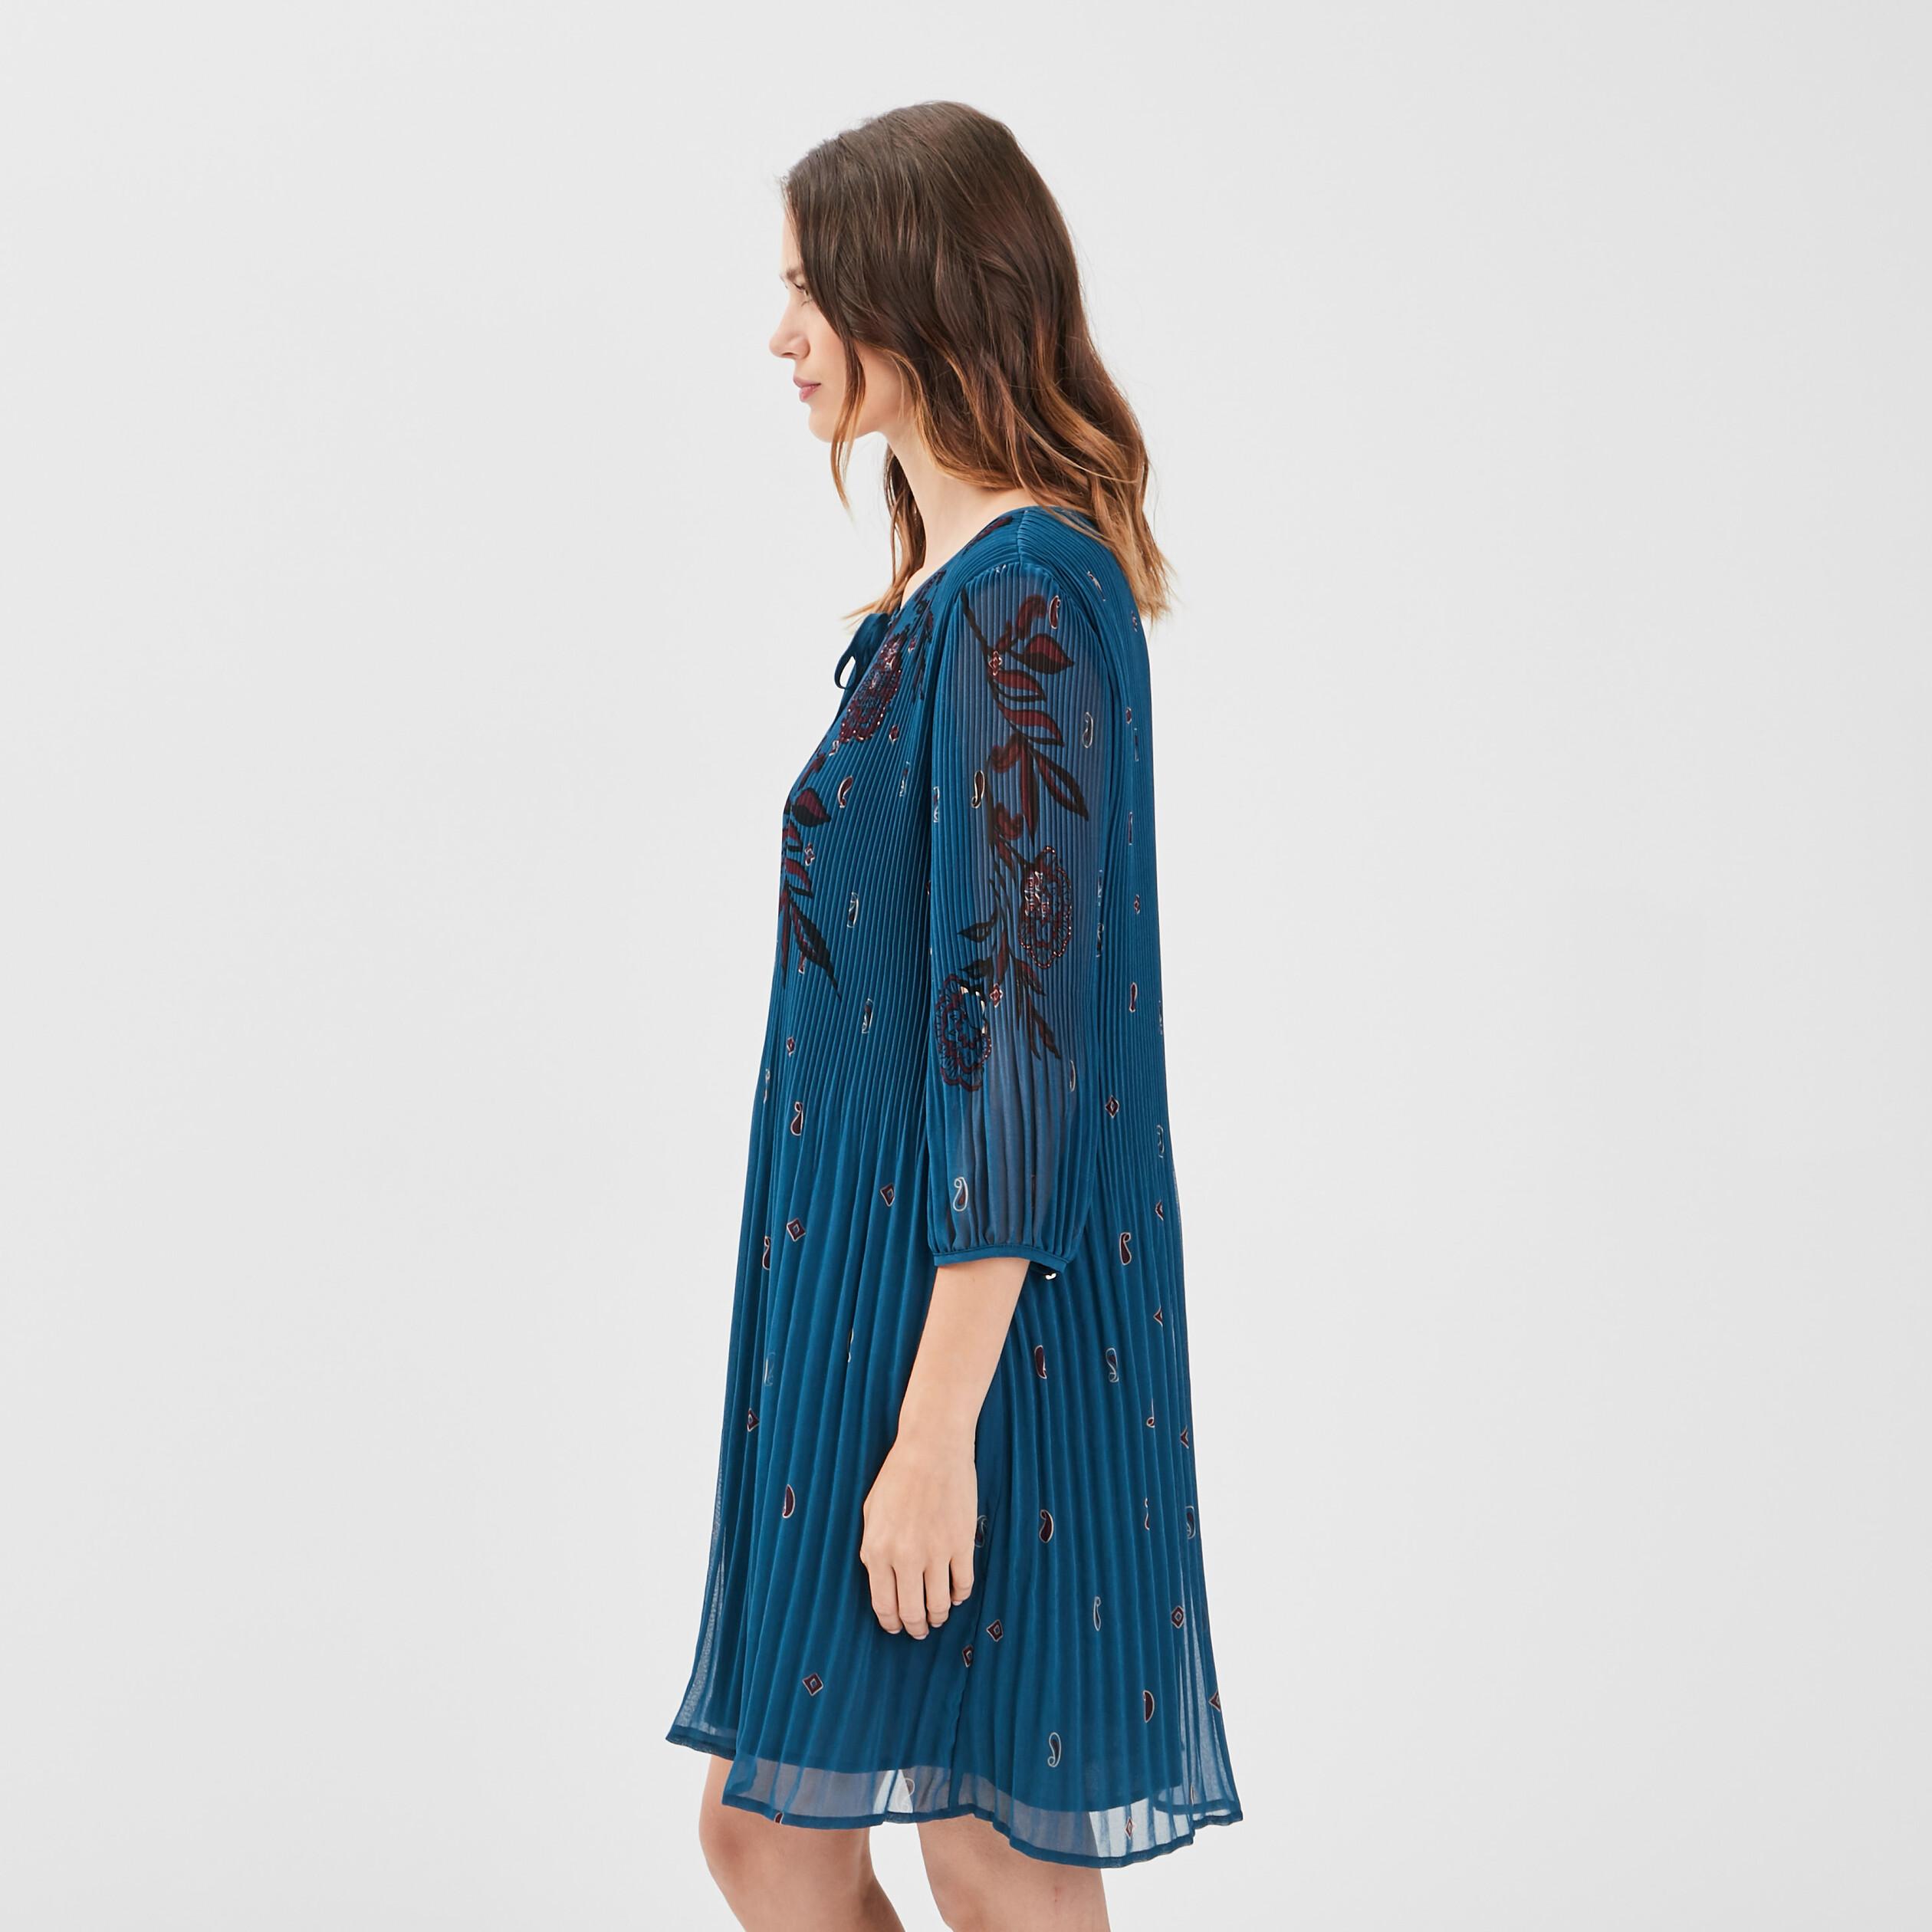 Robe Evasee Plissee Bleu Petrole Femme Breal